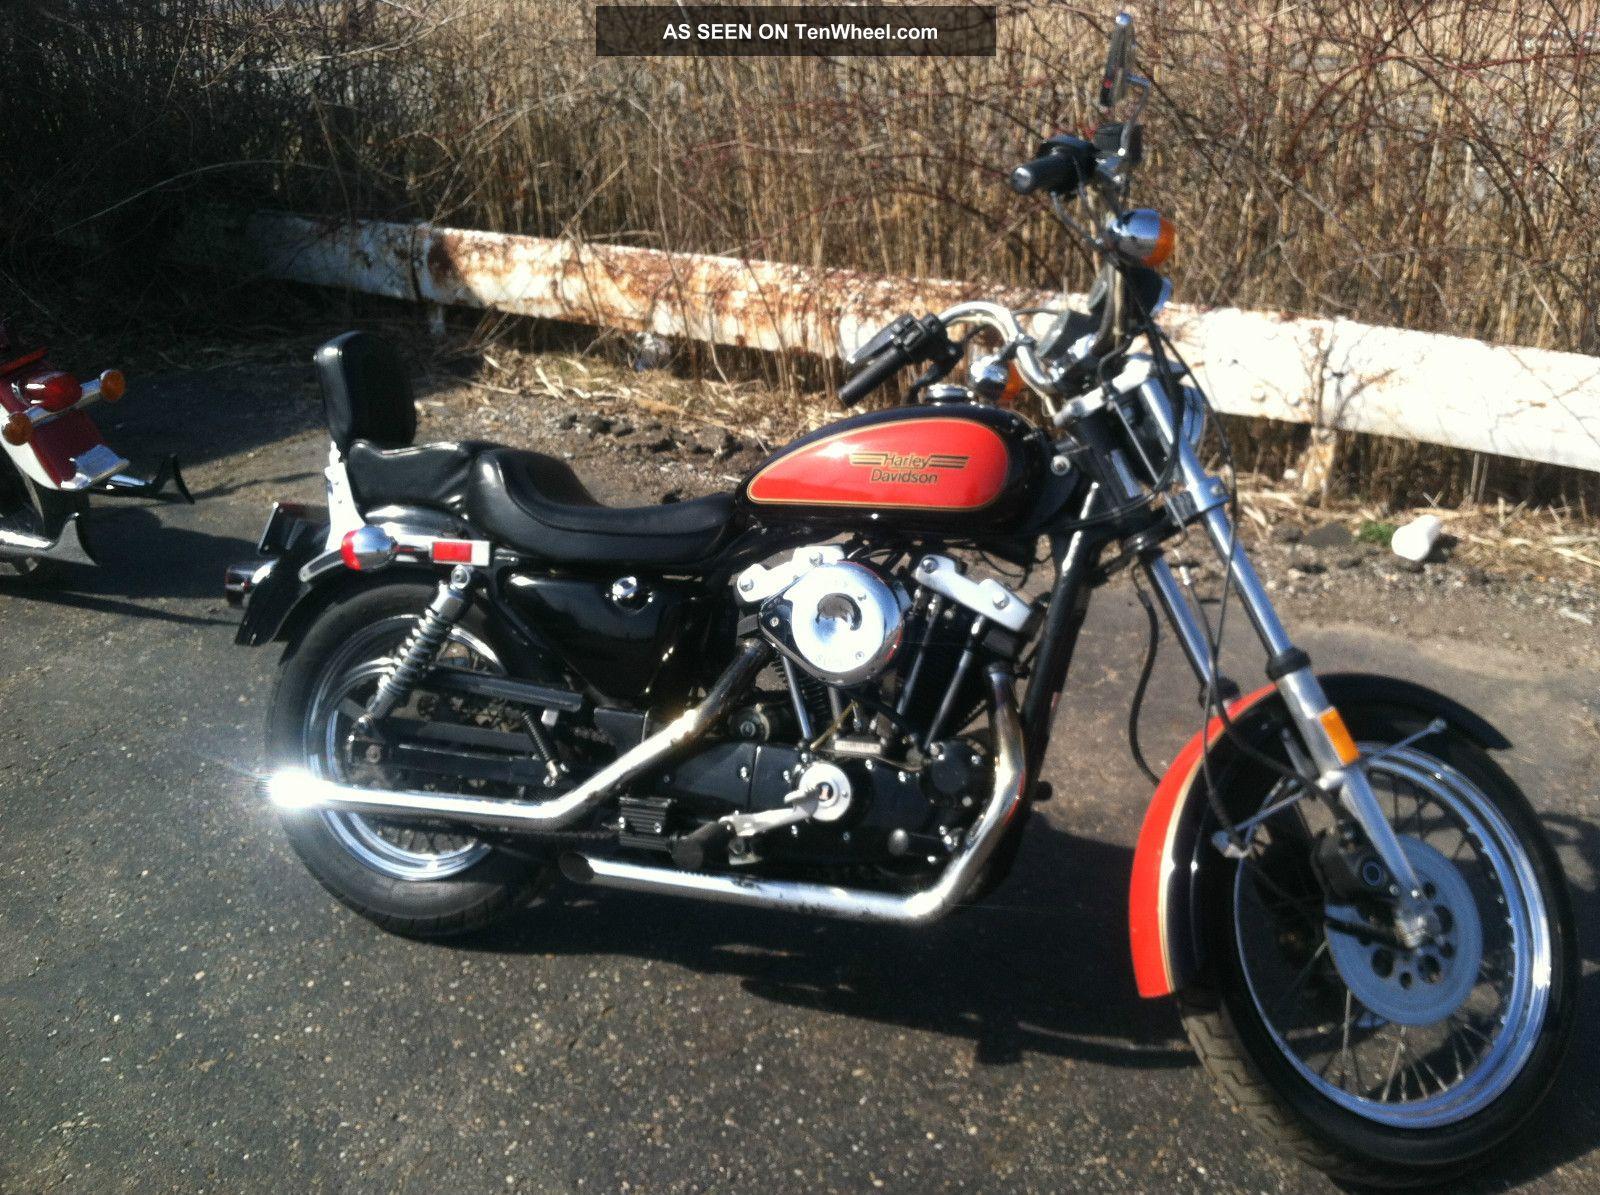 1982 Roadster Harley Davidson Paint Sportster photo